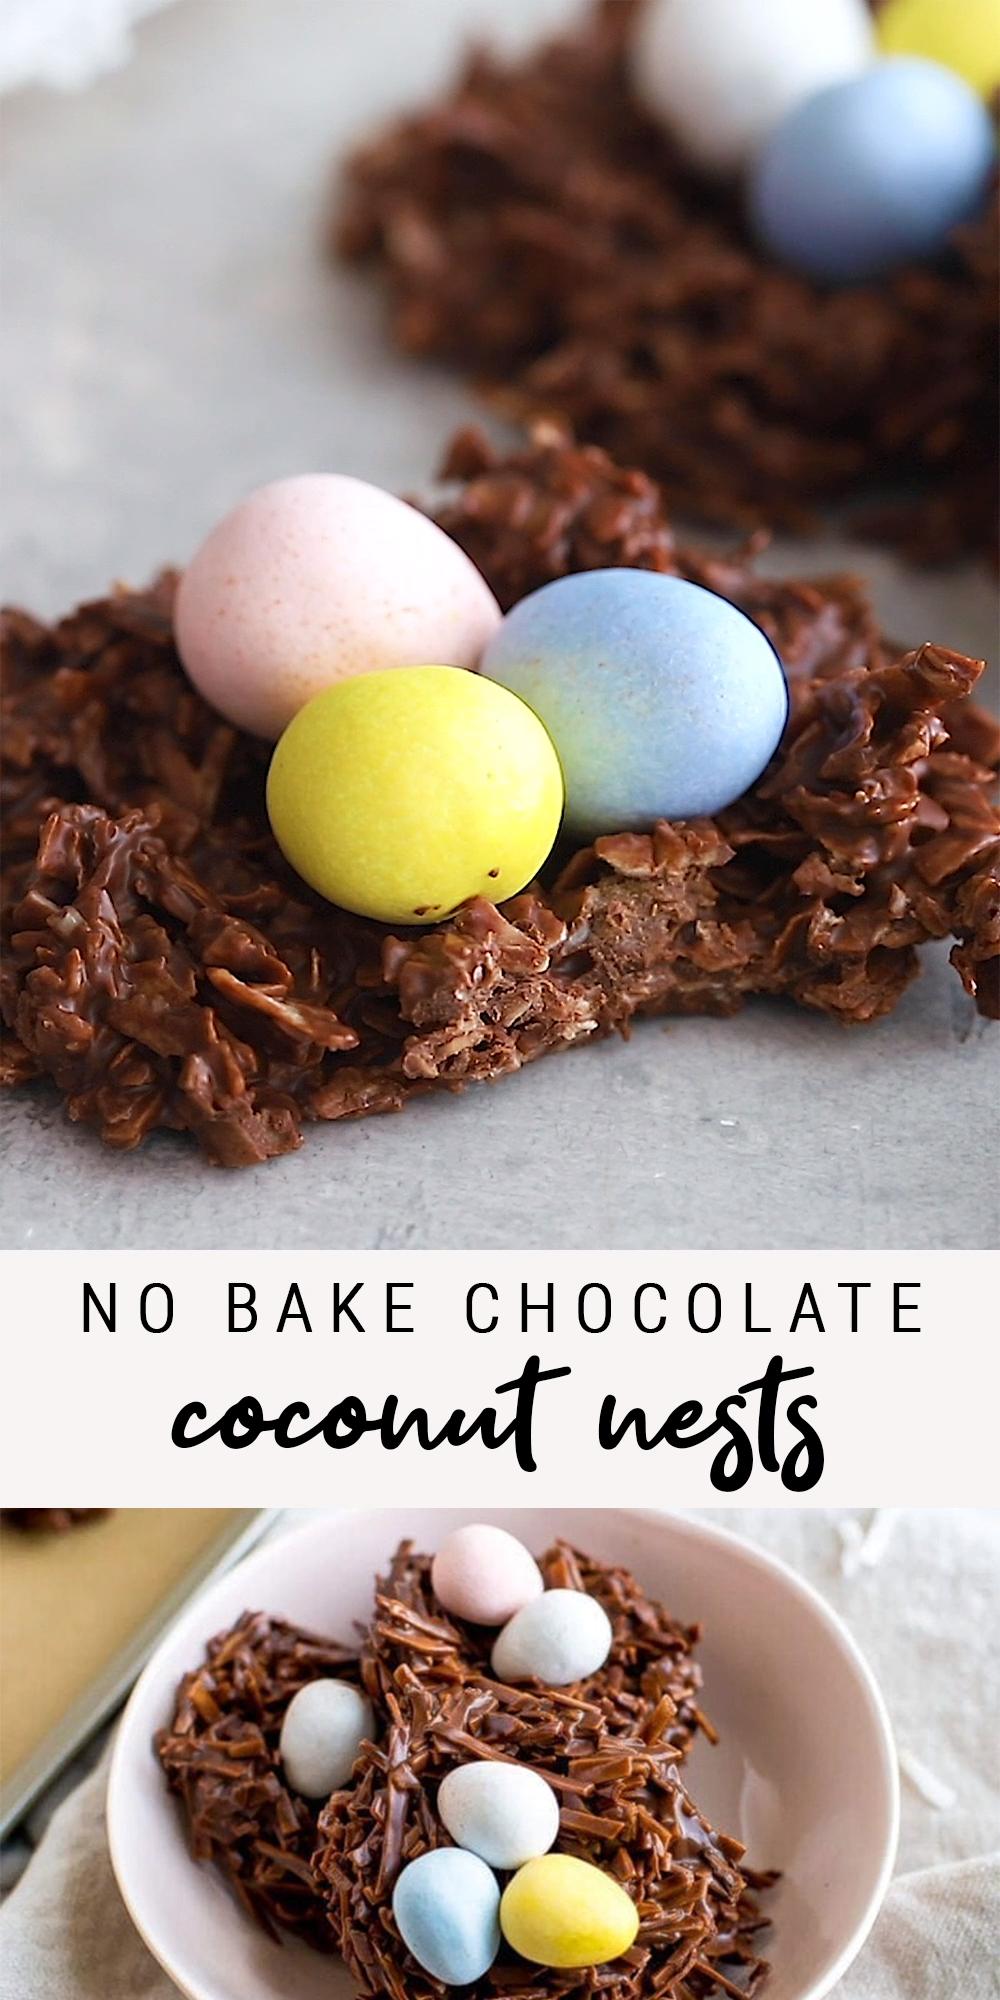 No Bake Chocolate Coconut Nests | Vegan + Gluten-Free -   Vegan + Gluten-Free, presentamos la mejor...